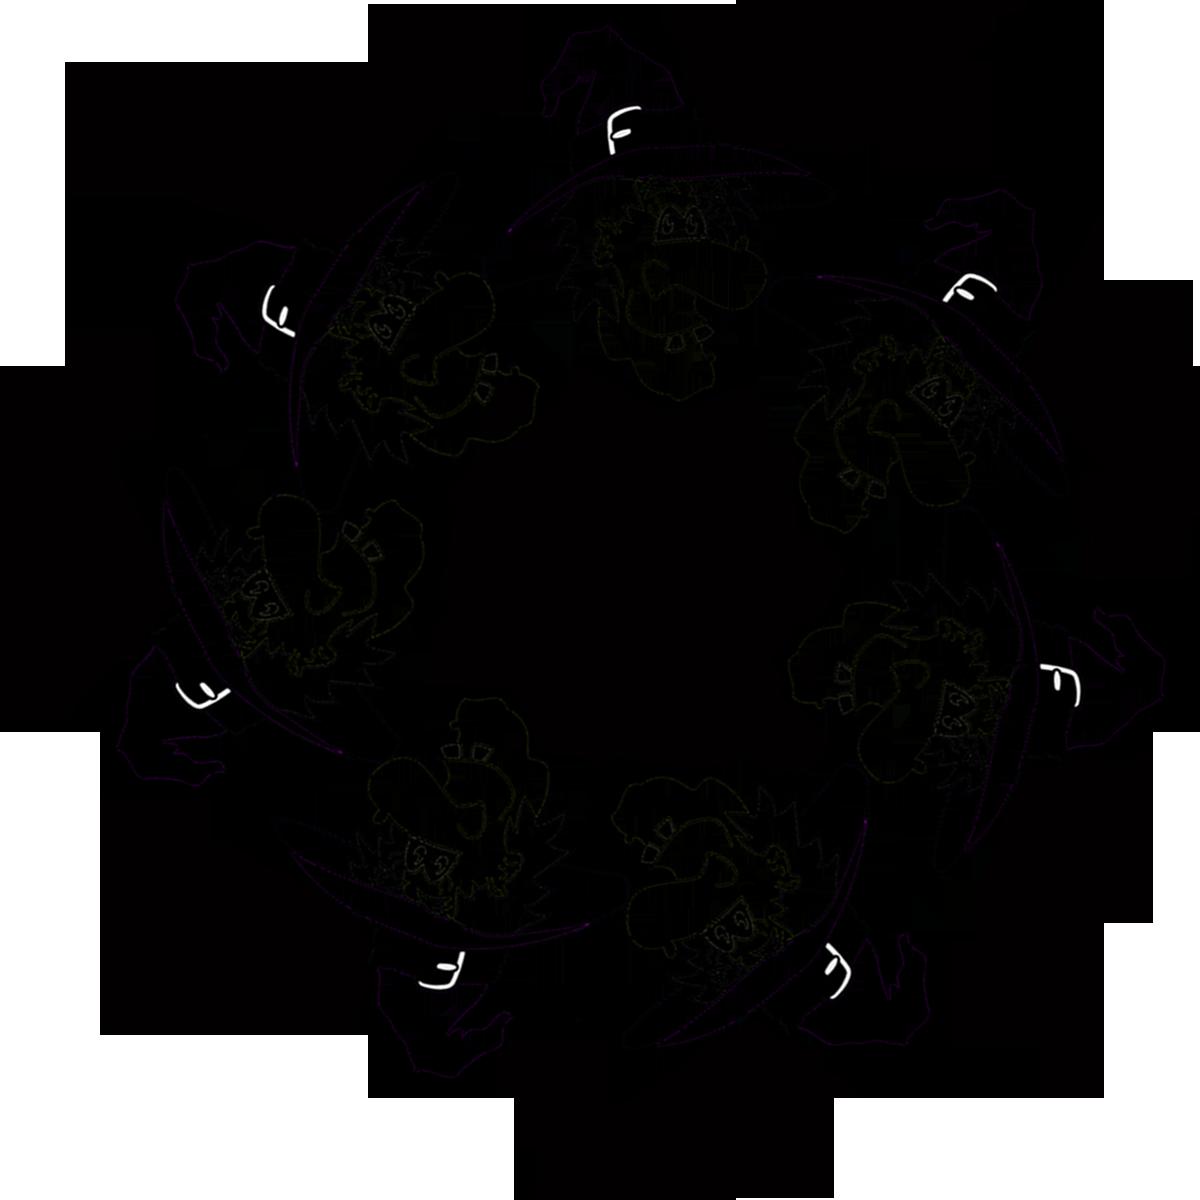 Mandala Hexenmotiv Walpurgisnacht Halloween Babyduda Malbuch Halloween Mandala Ausmalbilder Motive